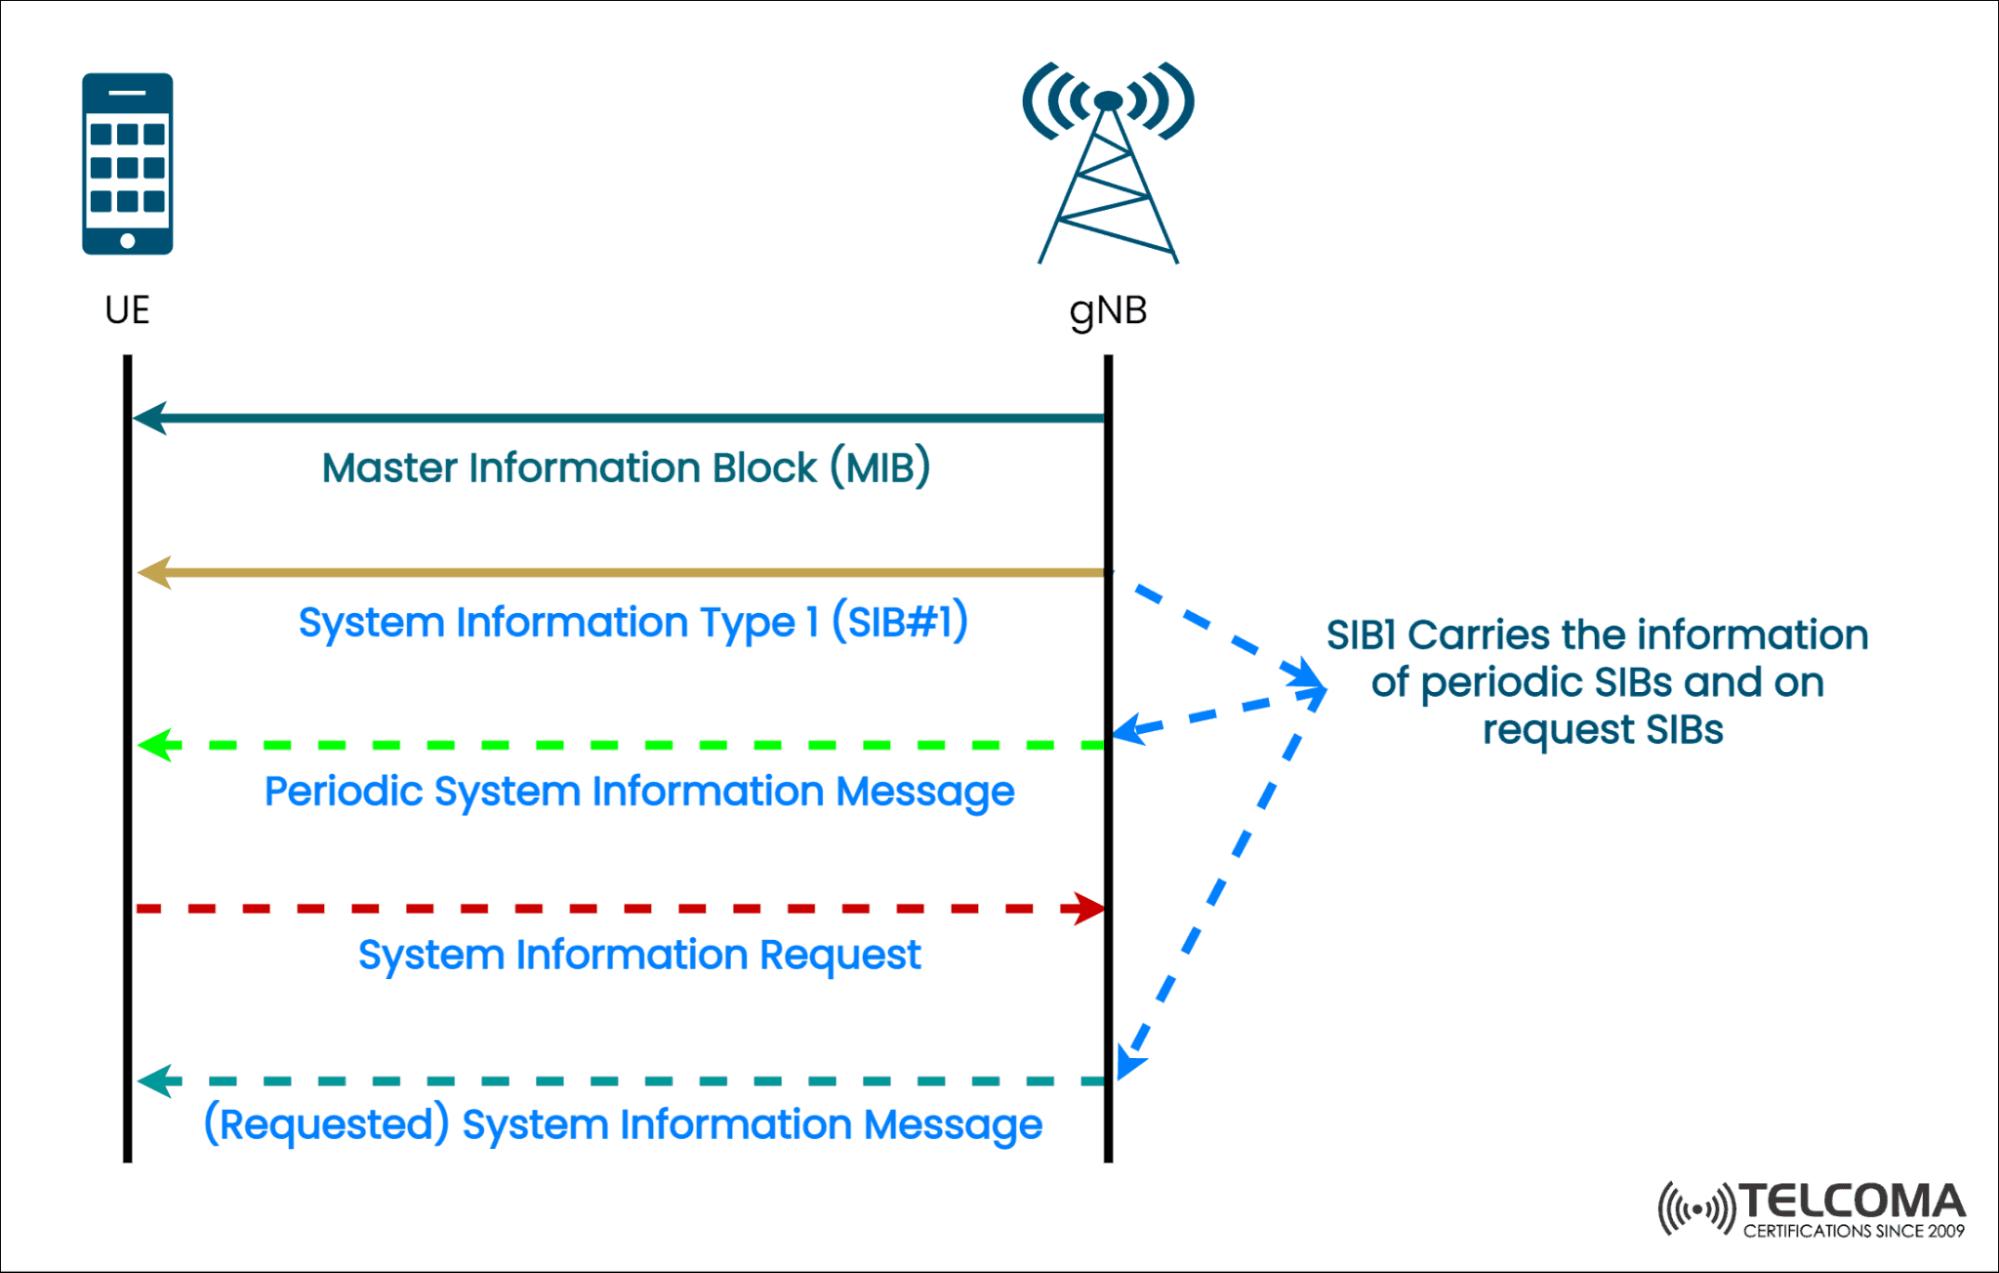 Signaling call flow MIB